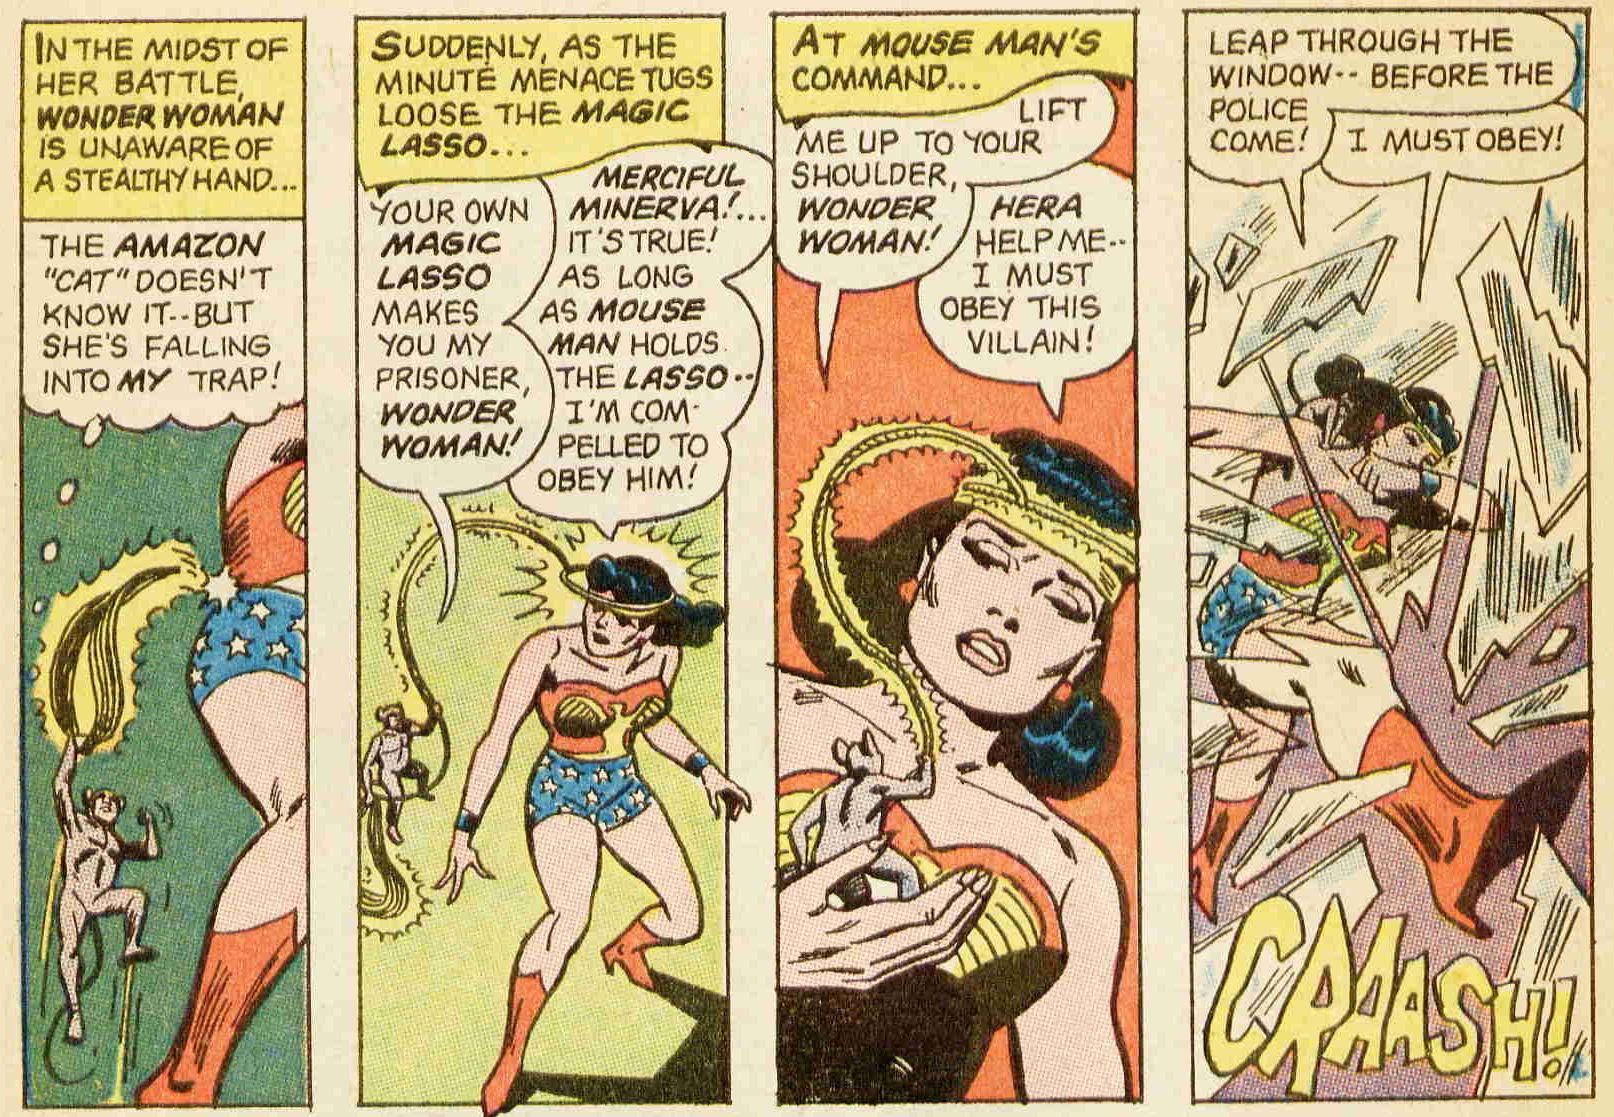 Wonder Woman 171 Julij-Avgust, 1967 Napad 50-2151